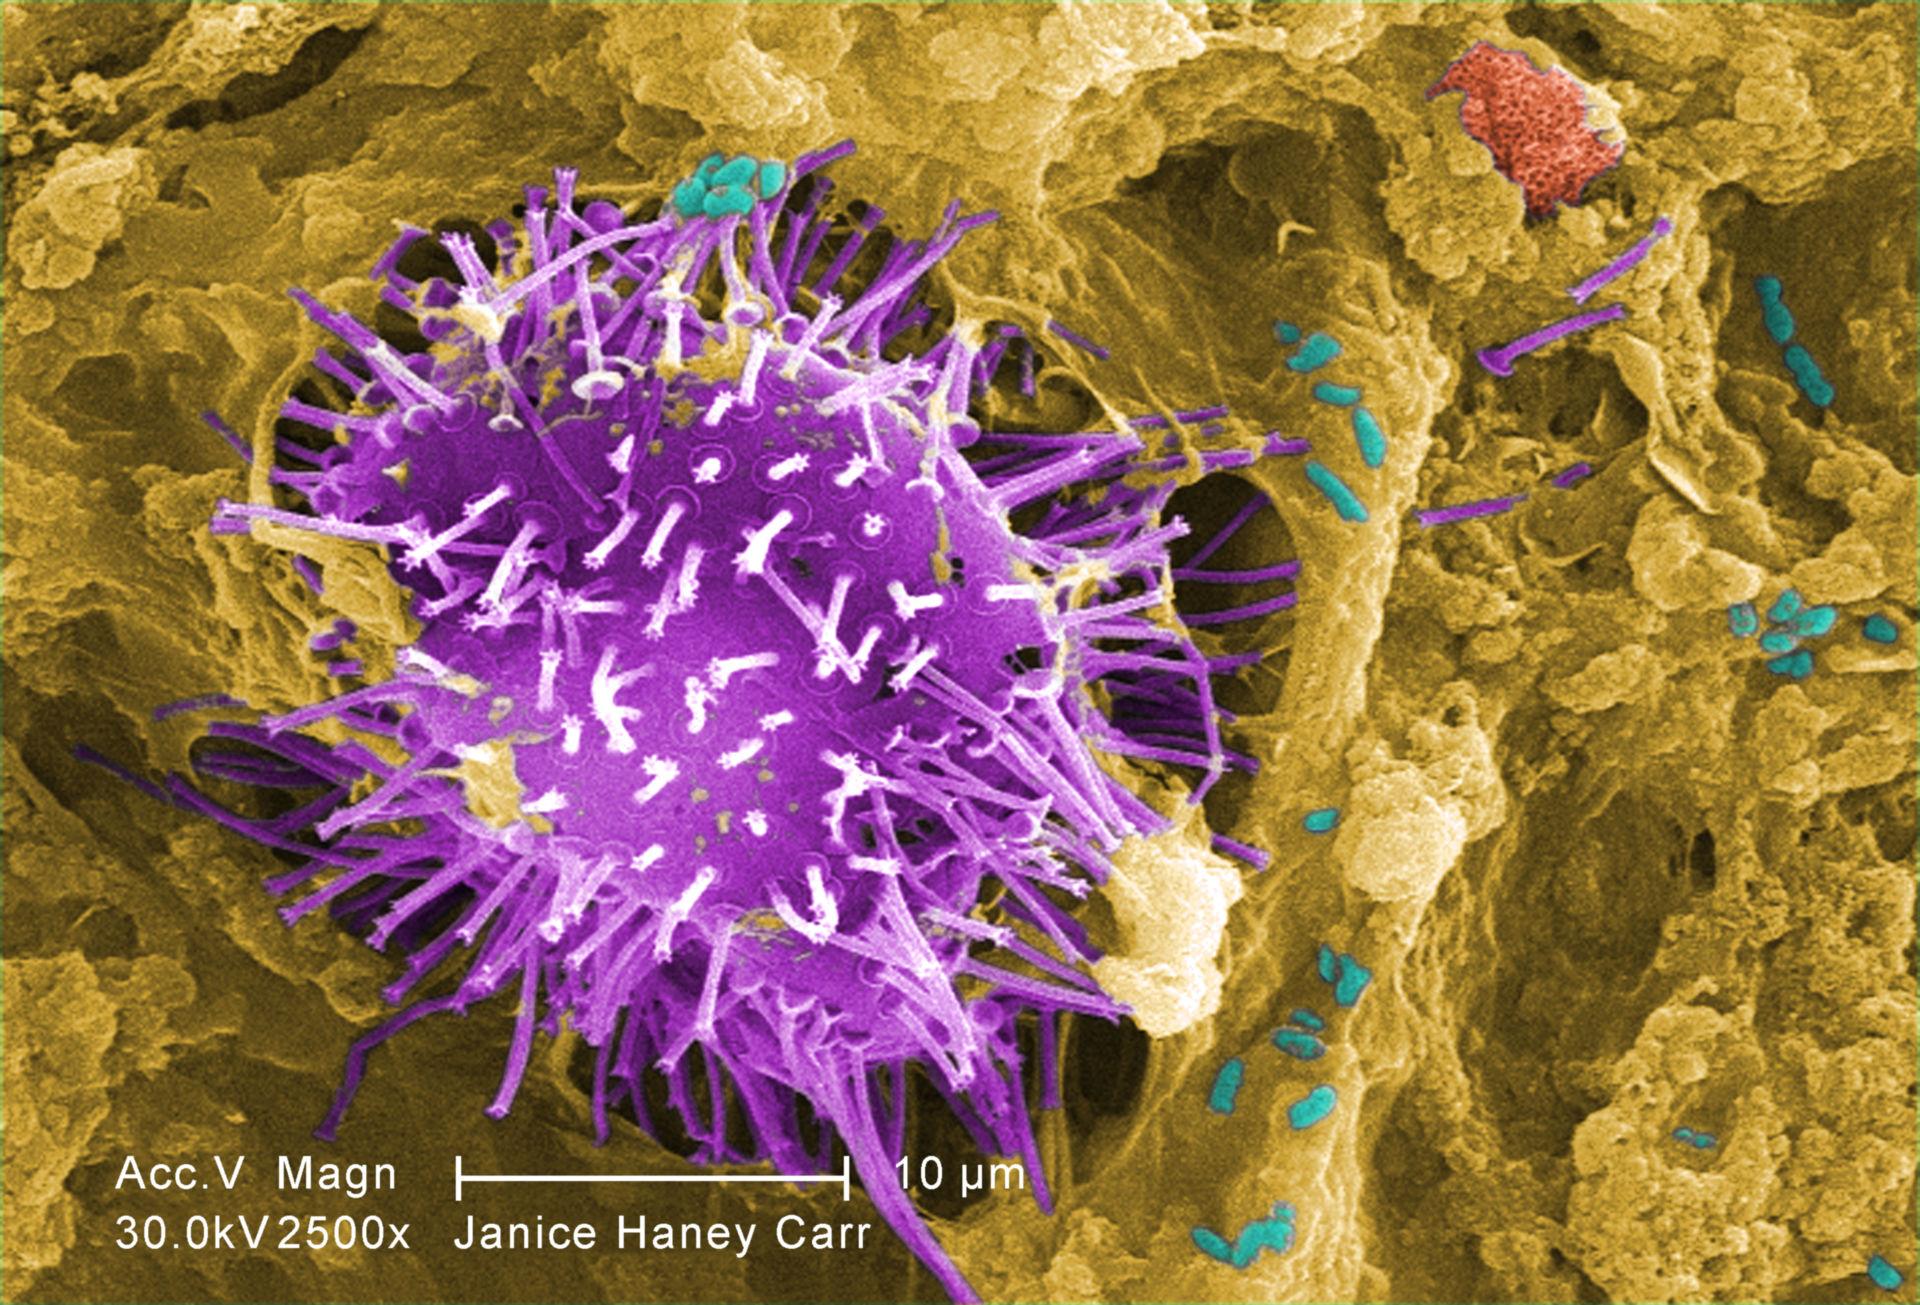 Mikroorganismen unter Rasterelektronenmikroskop (REM)